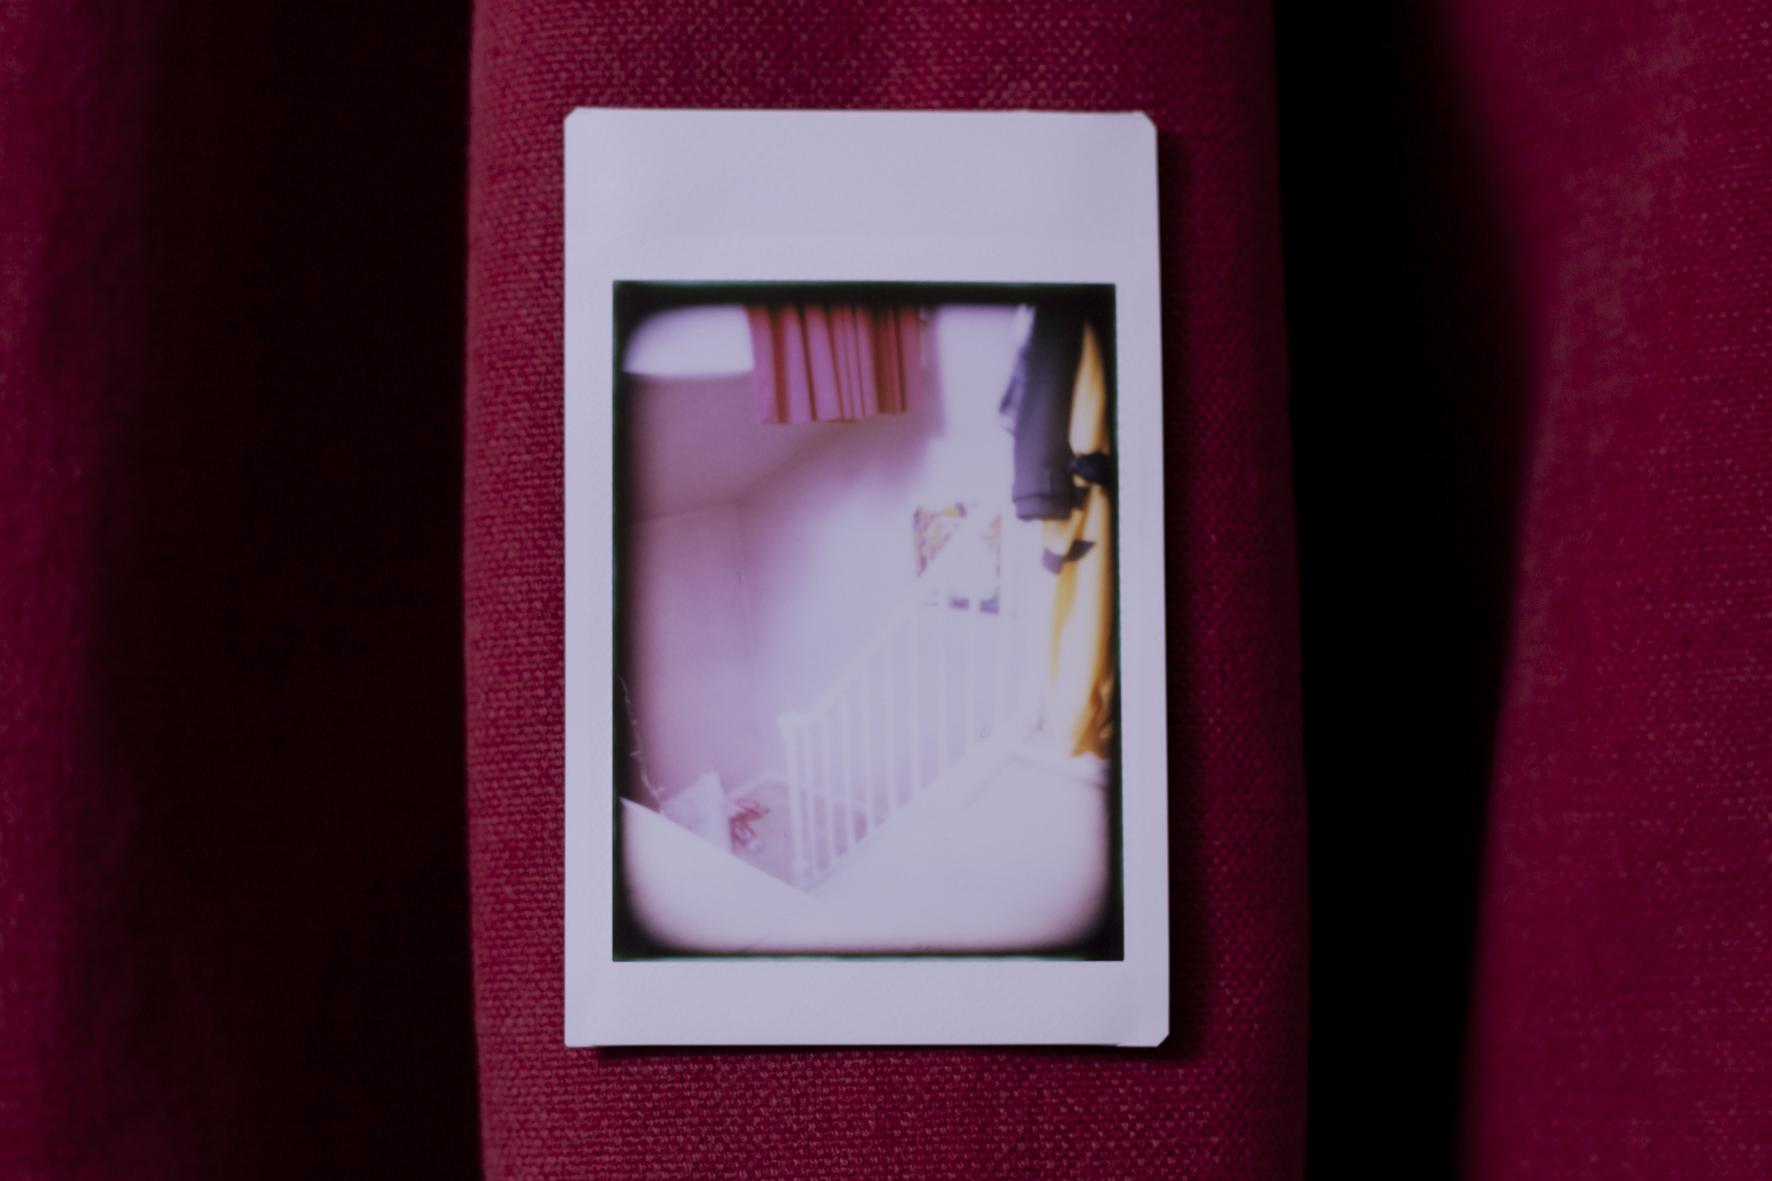 curtain jpg.jpg